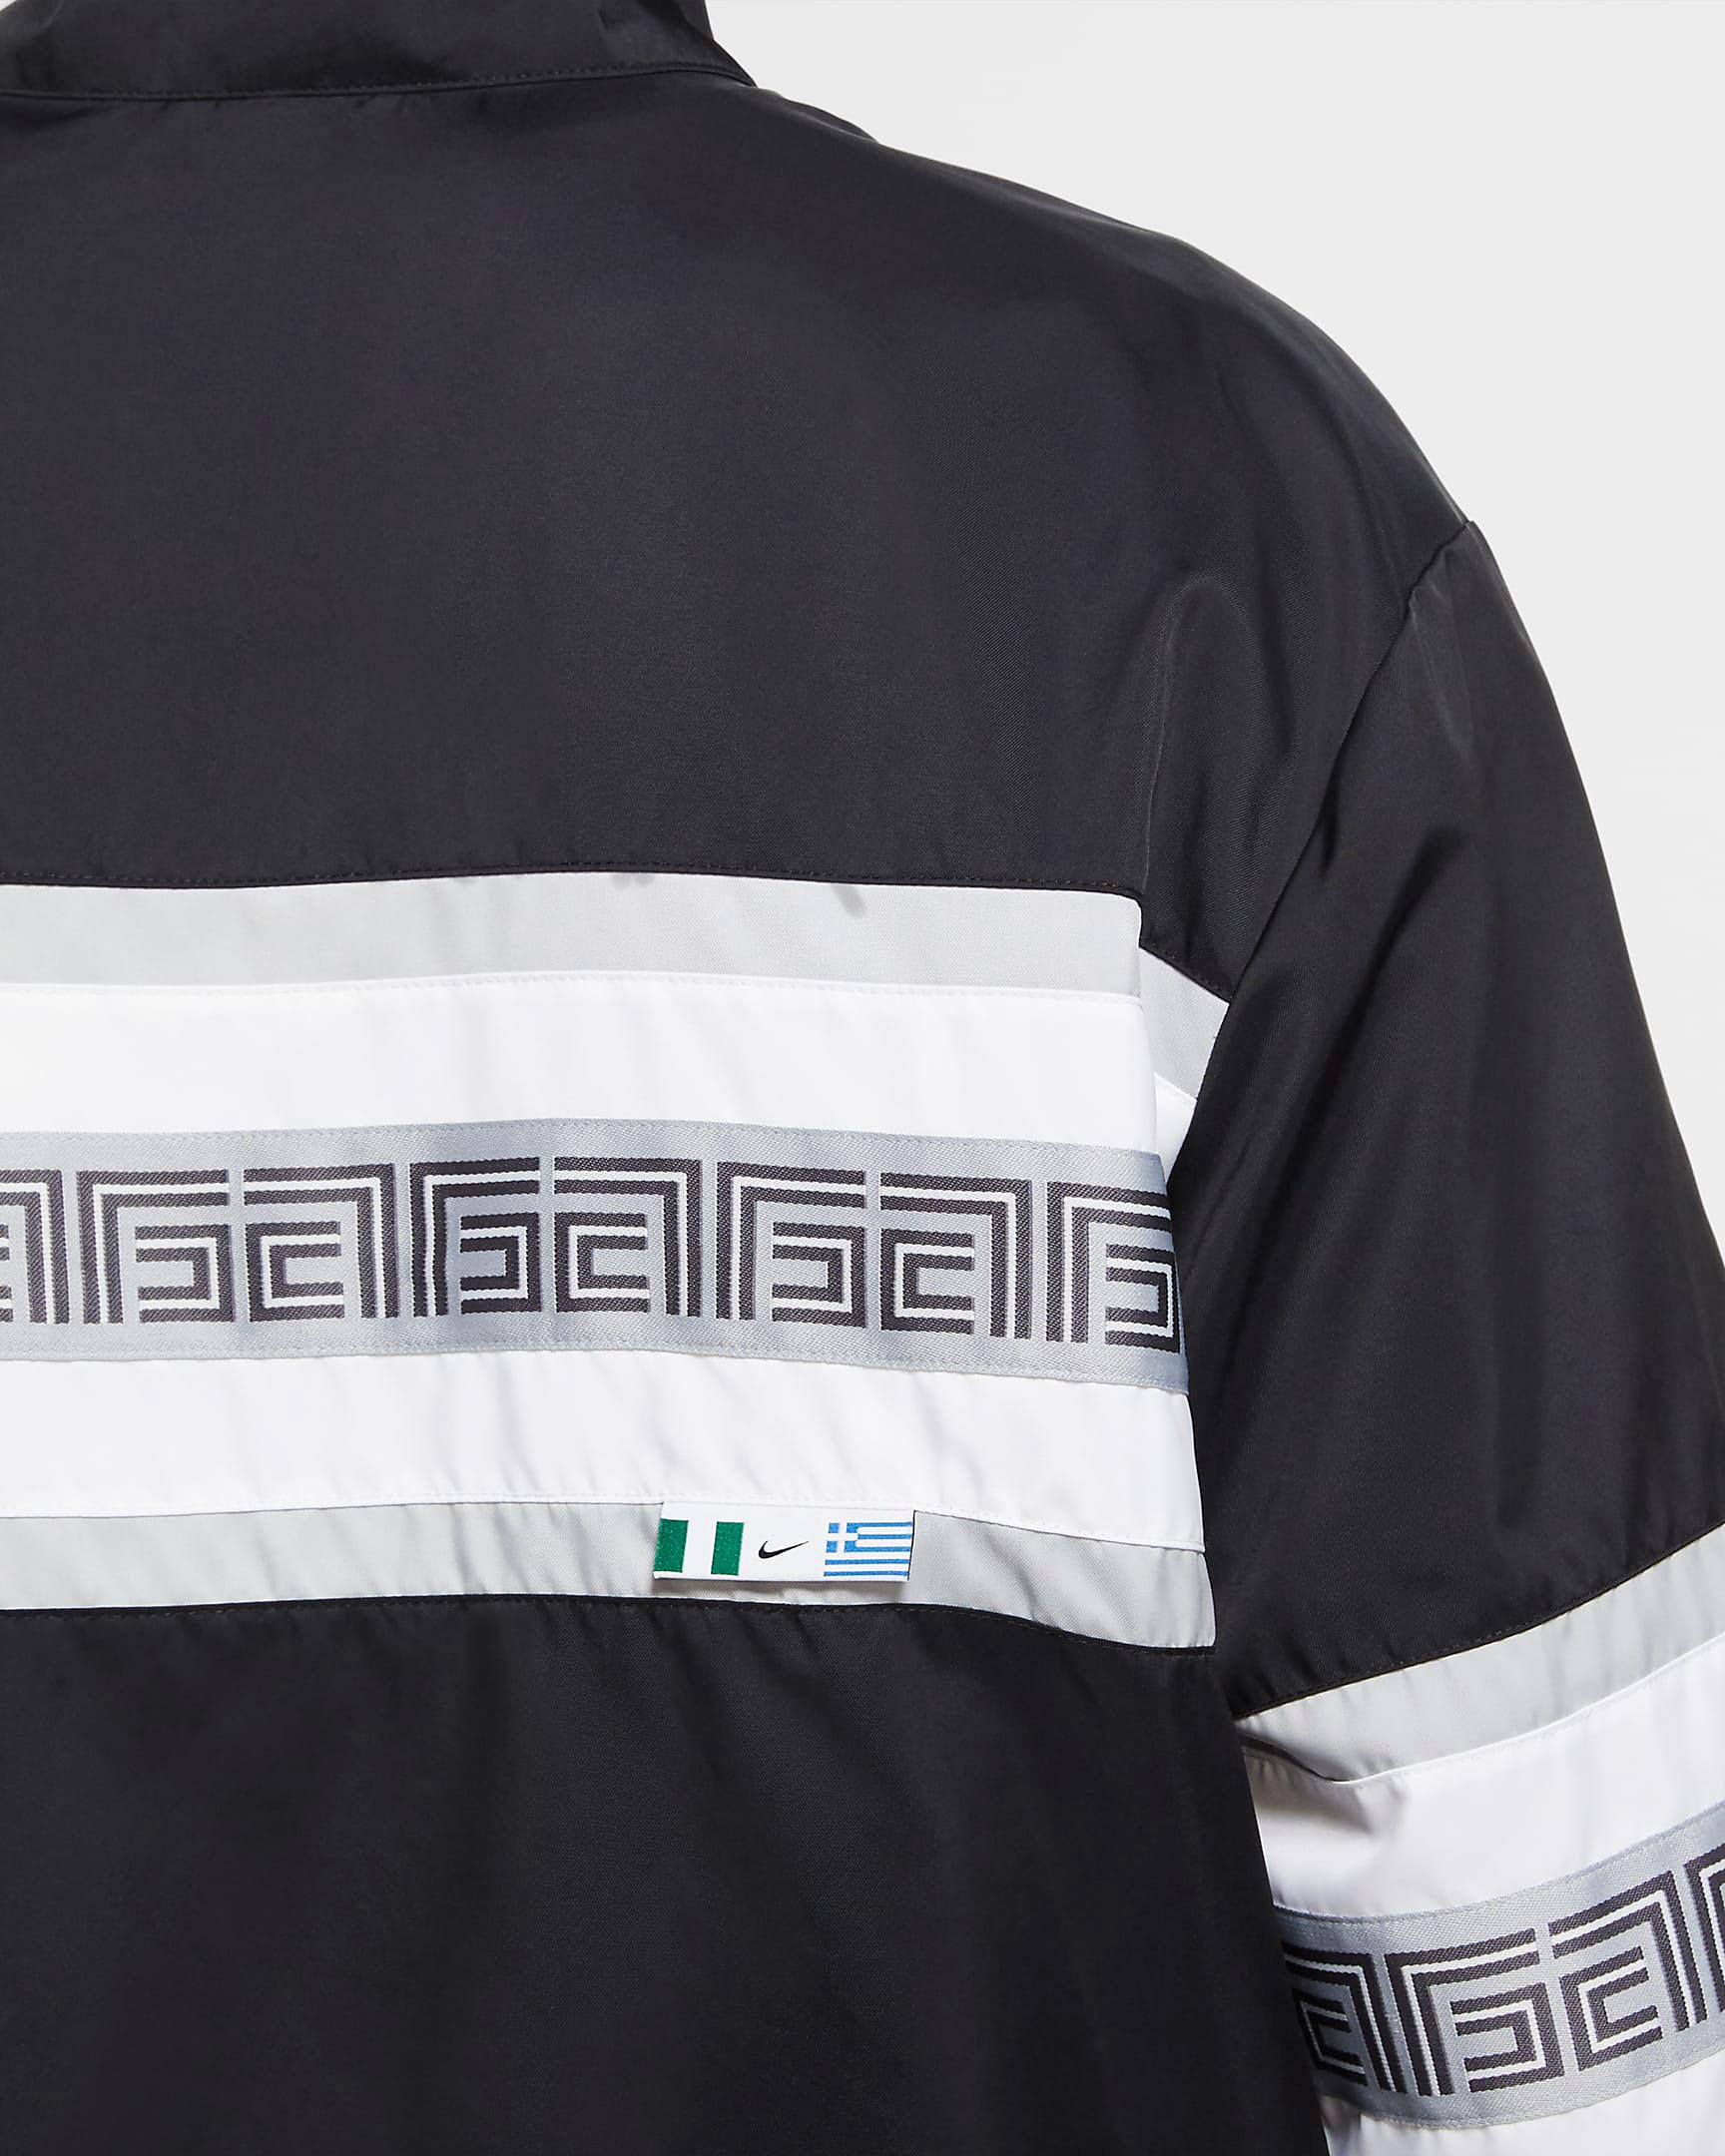 nike-giannis-jacket-black-white-4